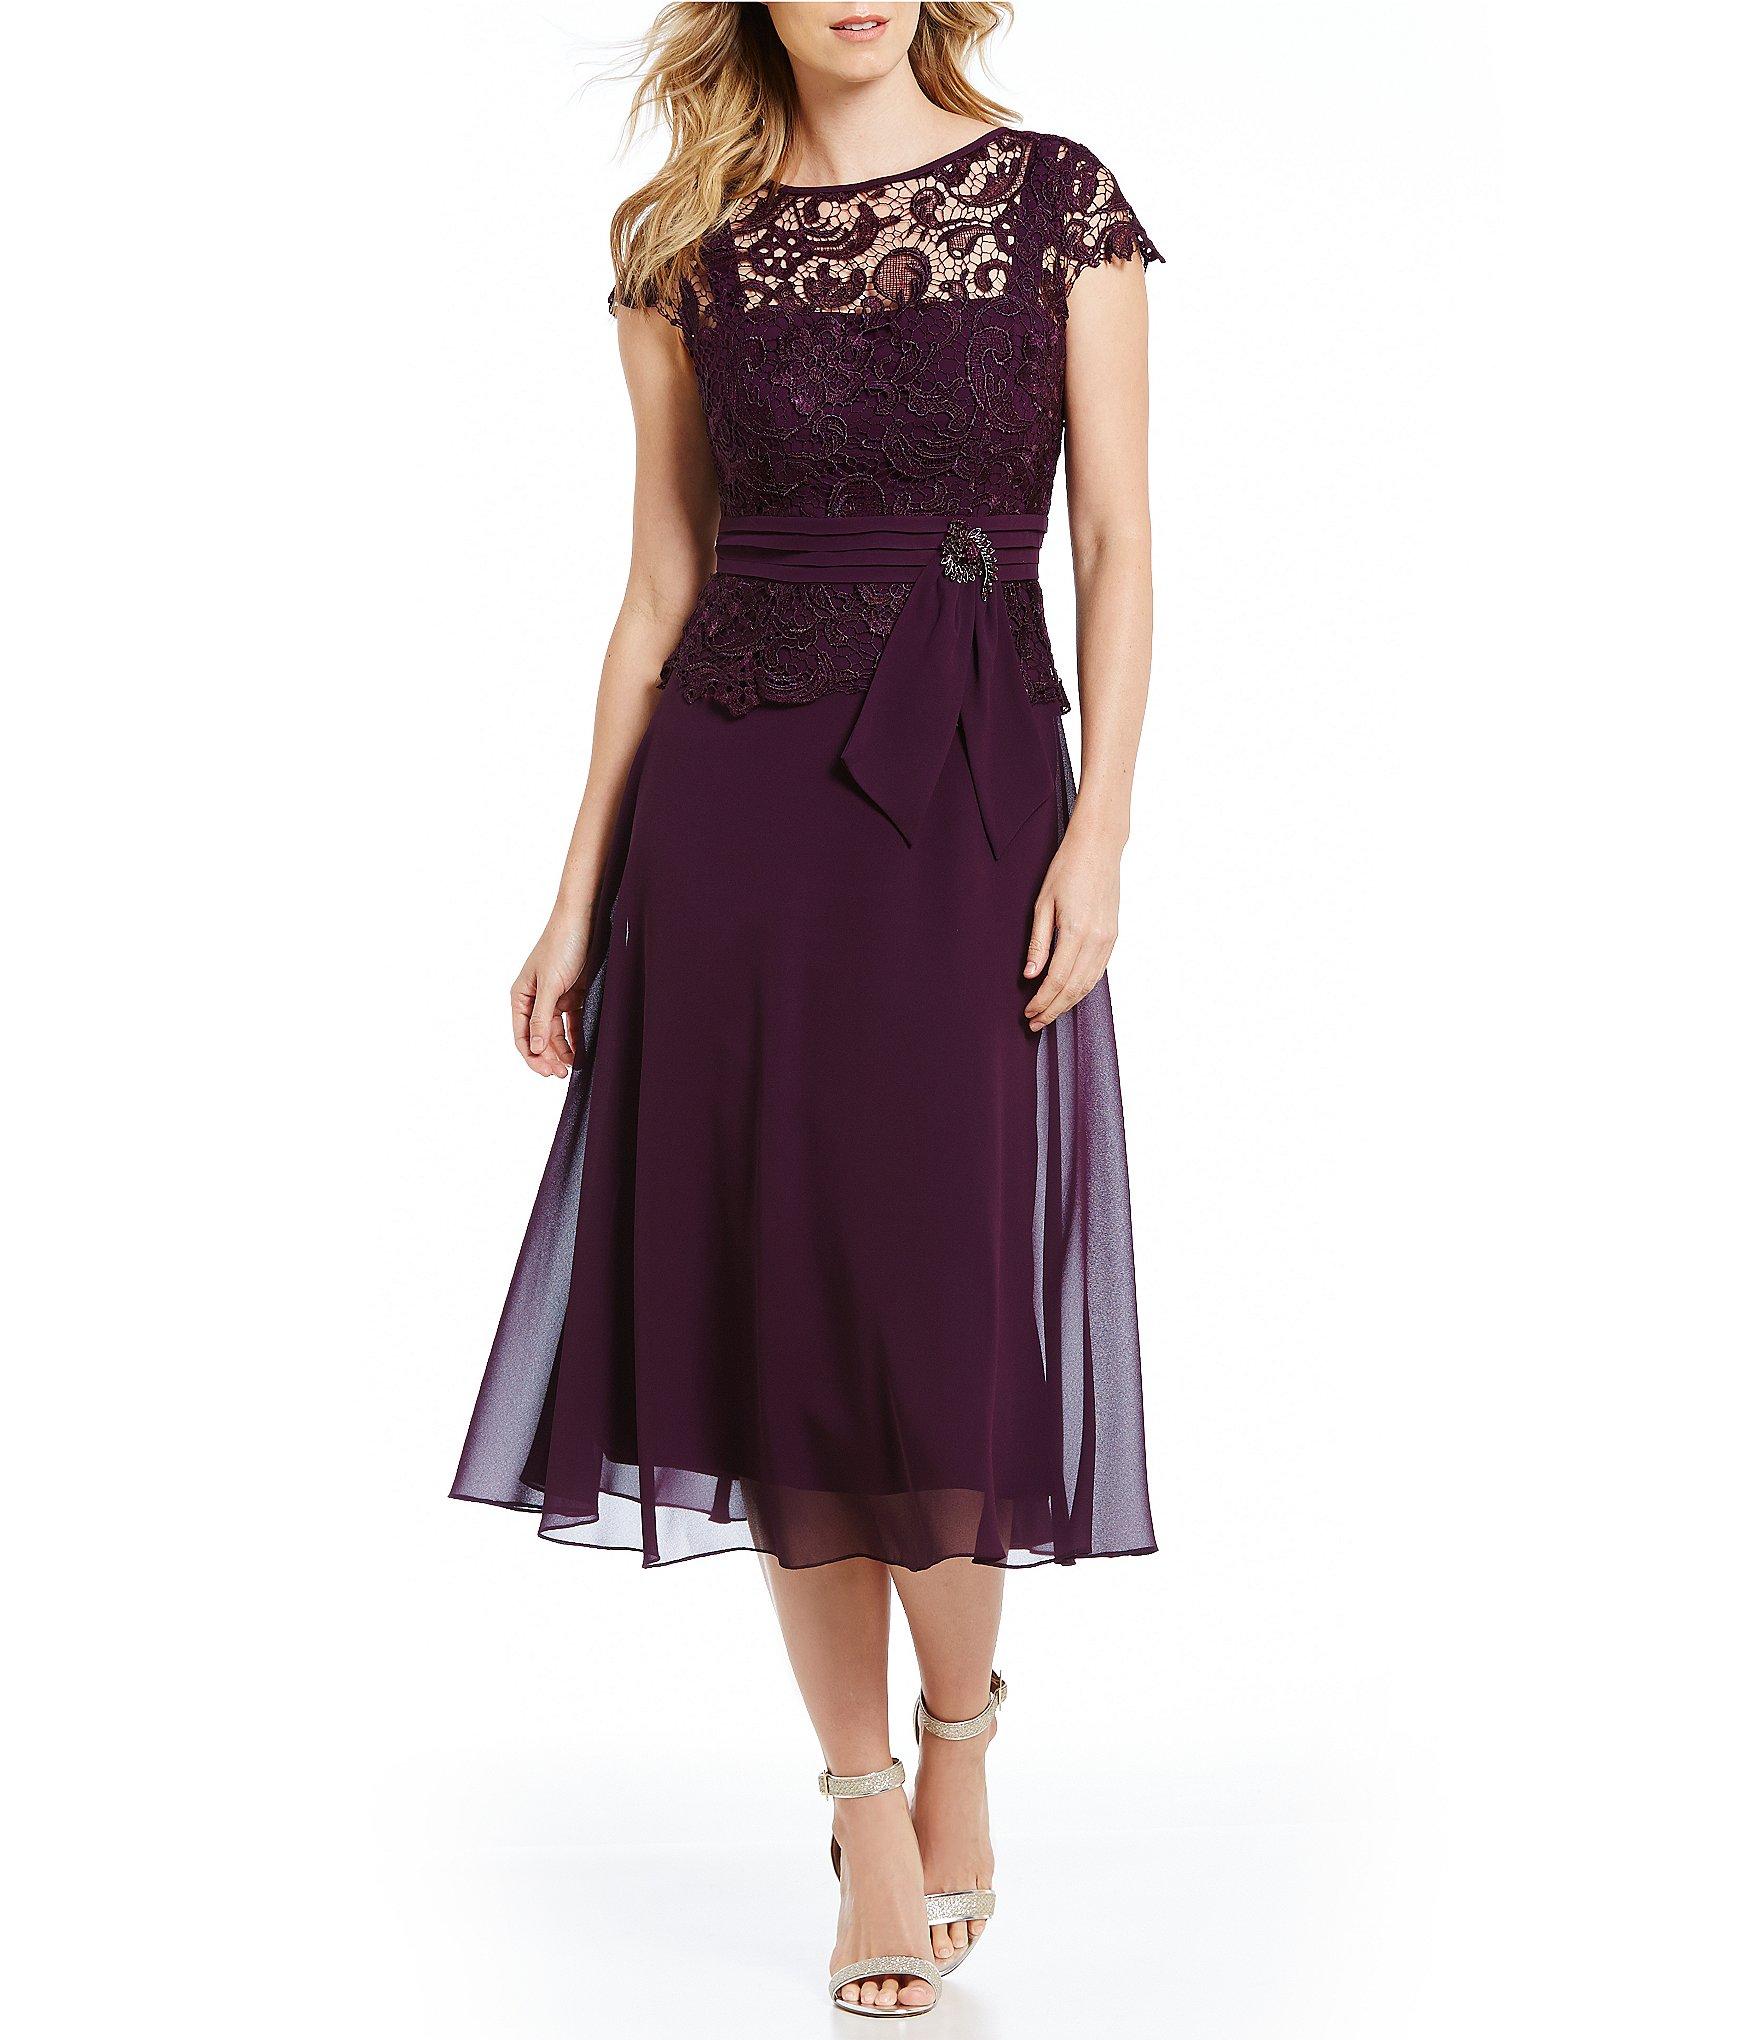 Dillard S Wedding Registry: Emma Street Illusion Lace Mock 2-Piece Dress